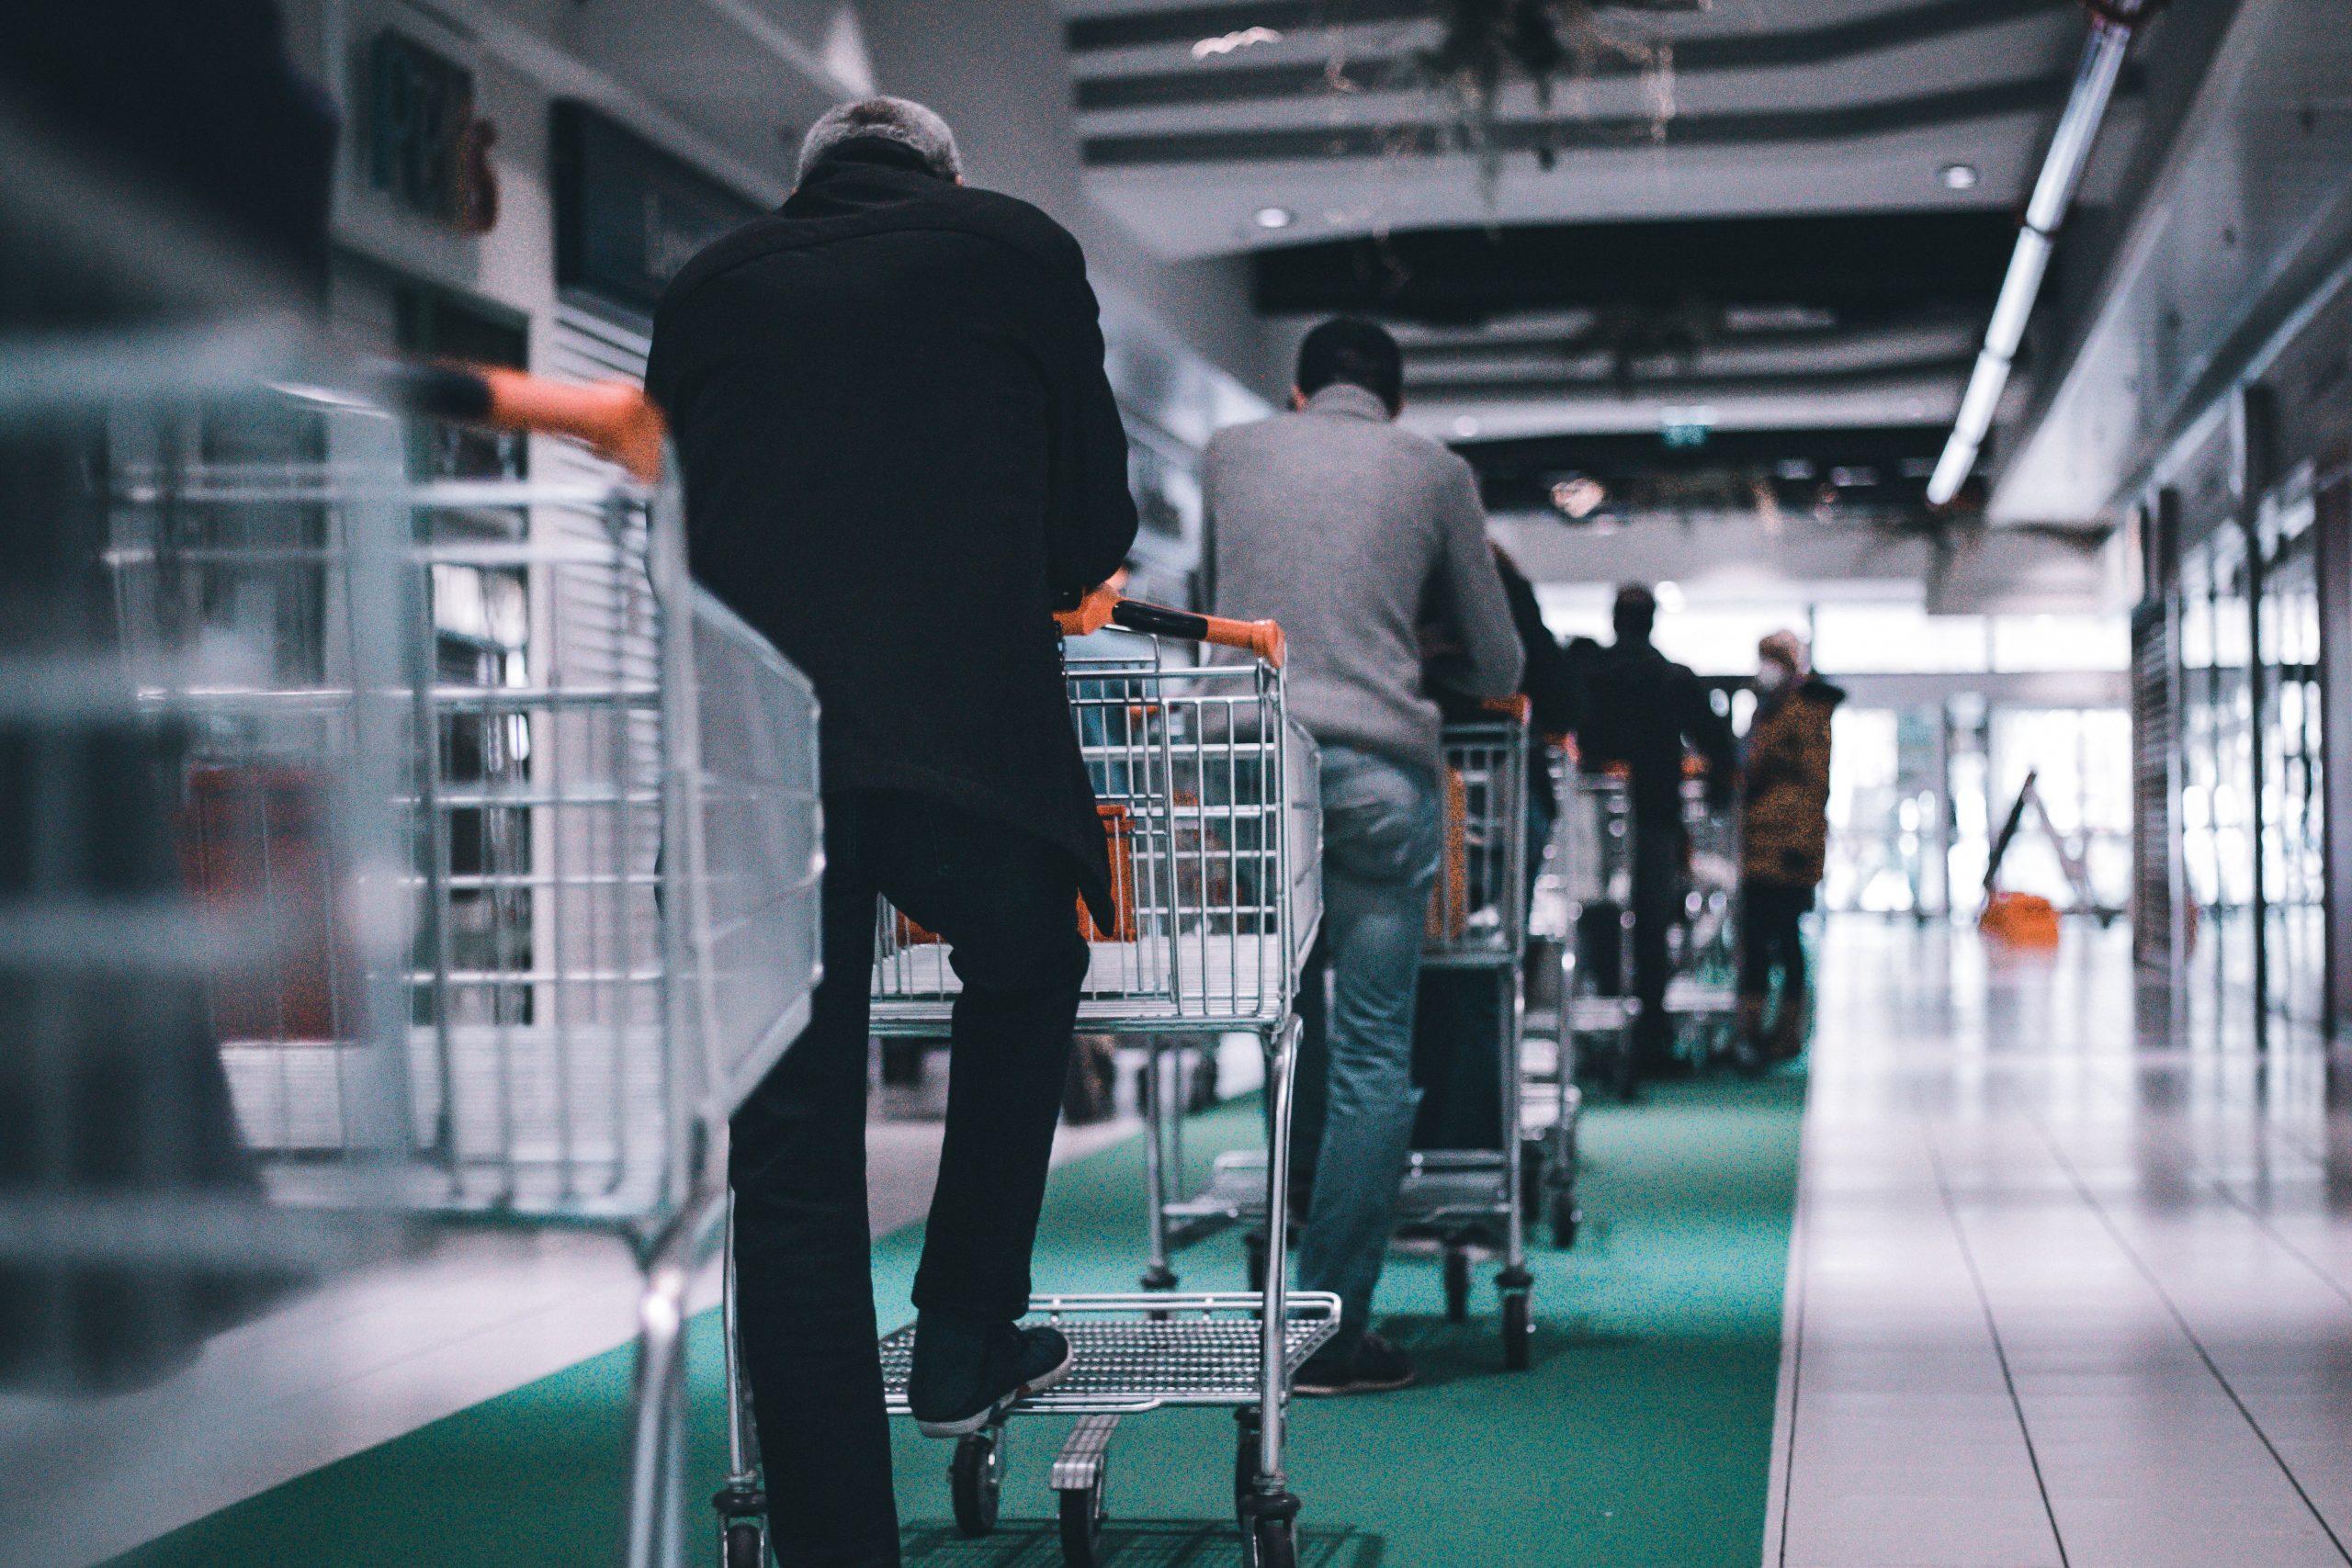 person pushing shopping carts